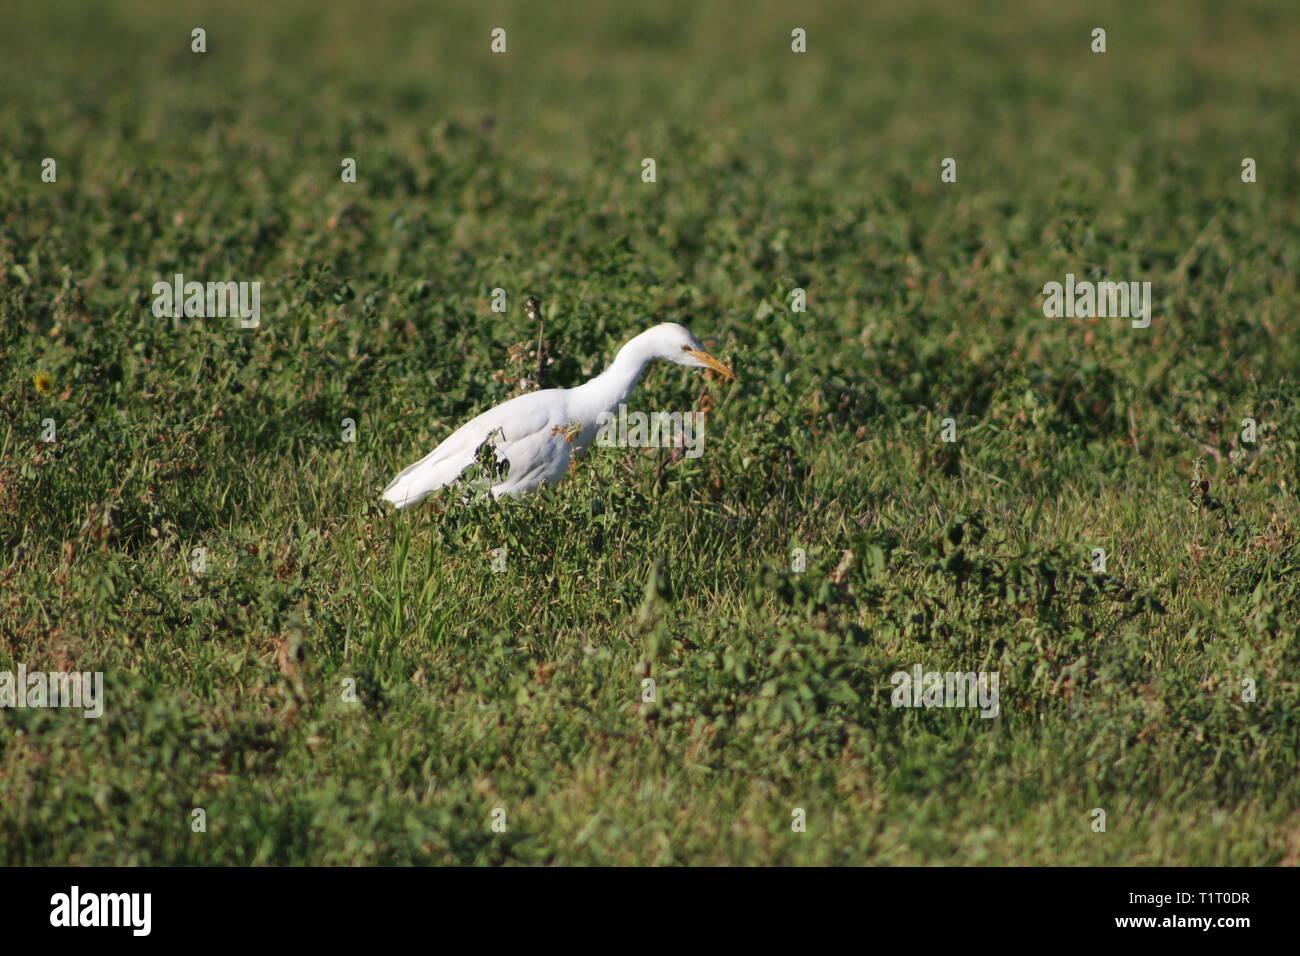 Bubulcus ibis - Stock Image